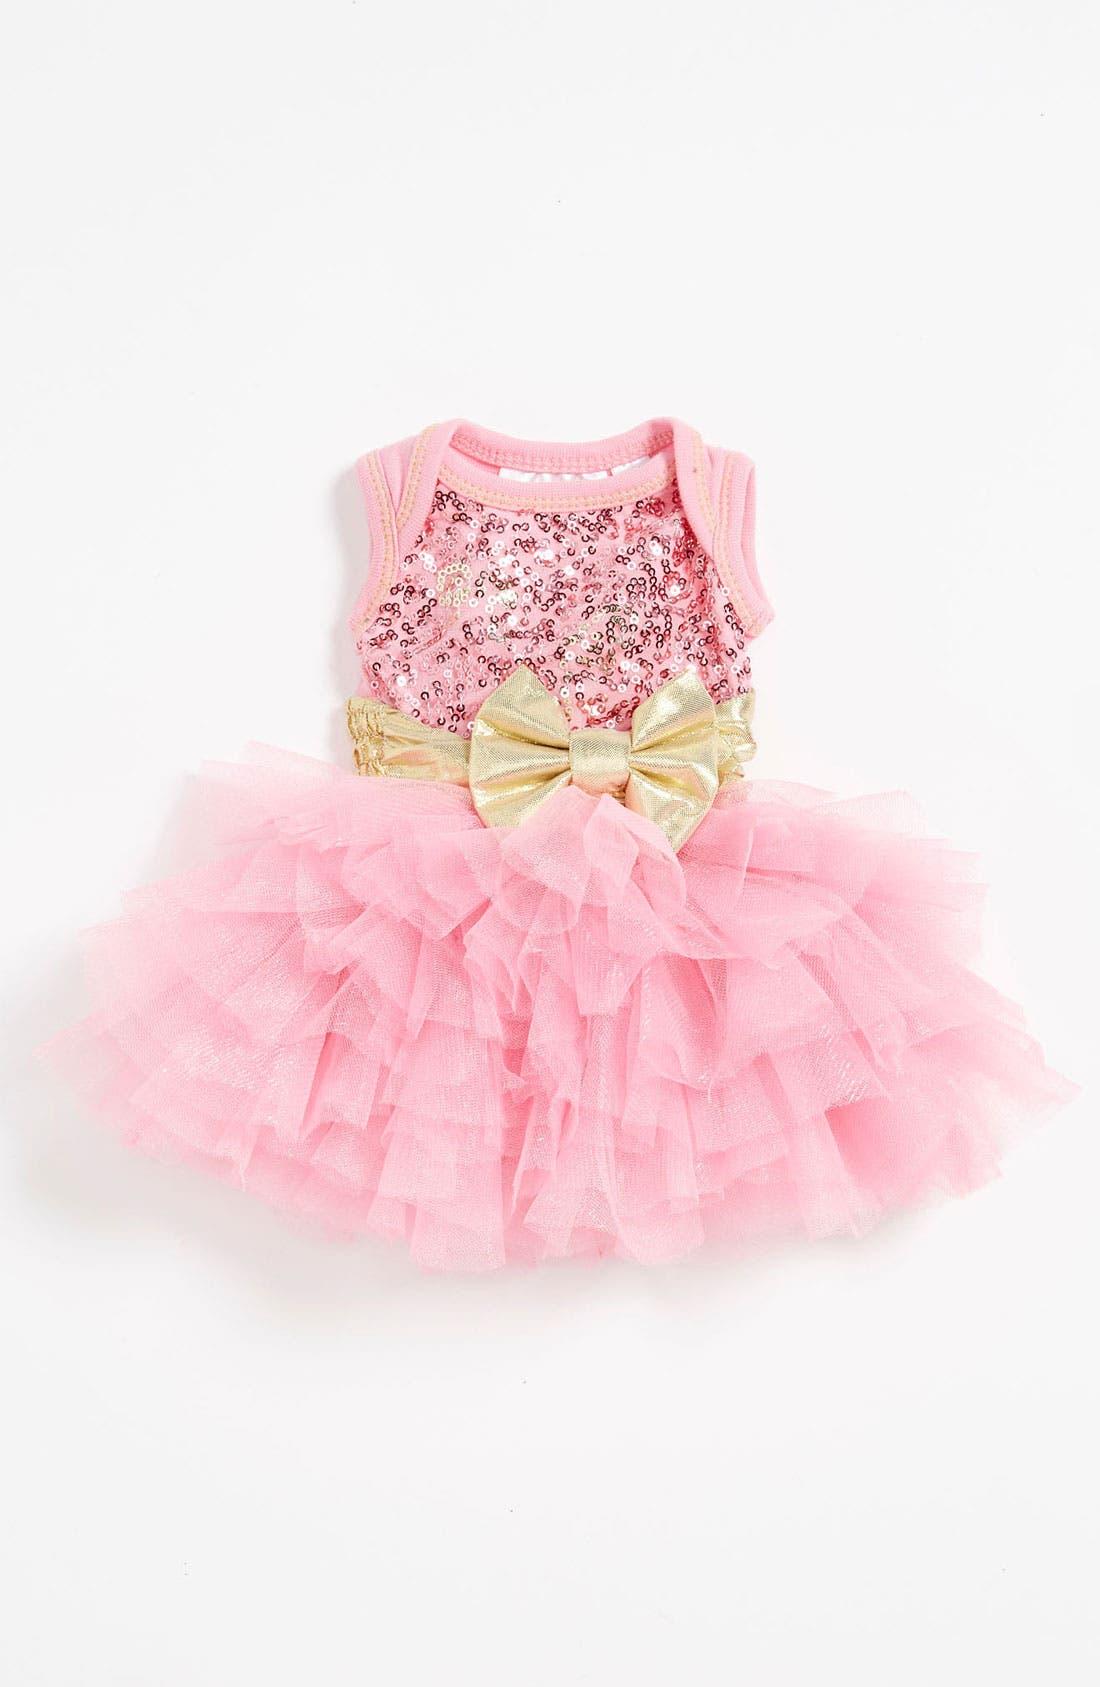 Alternate Image 1 Selected - Ooh! La, La! Couture 'Wow Dream' Doll Dress